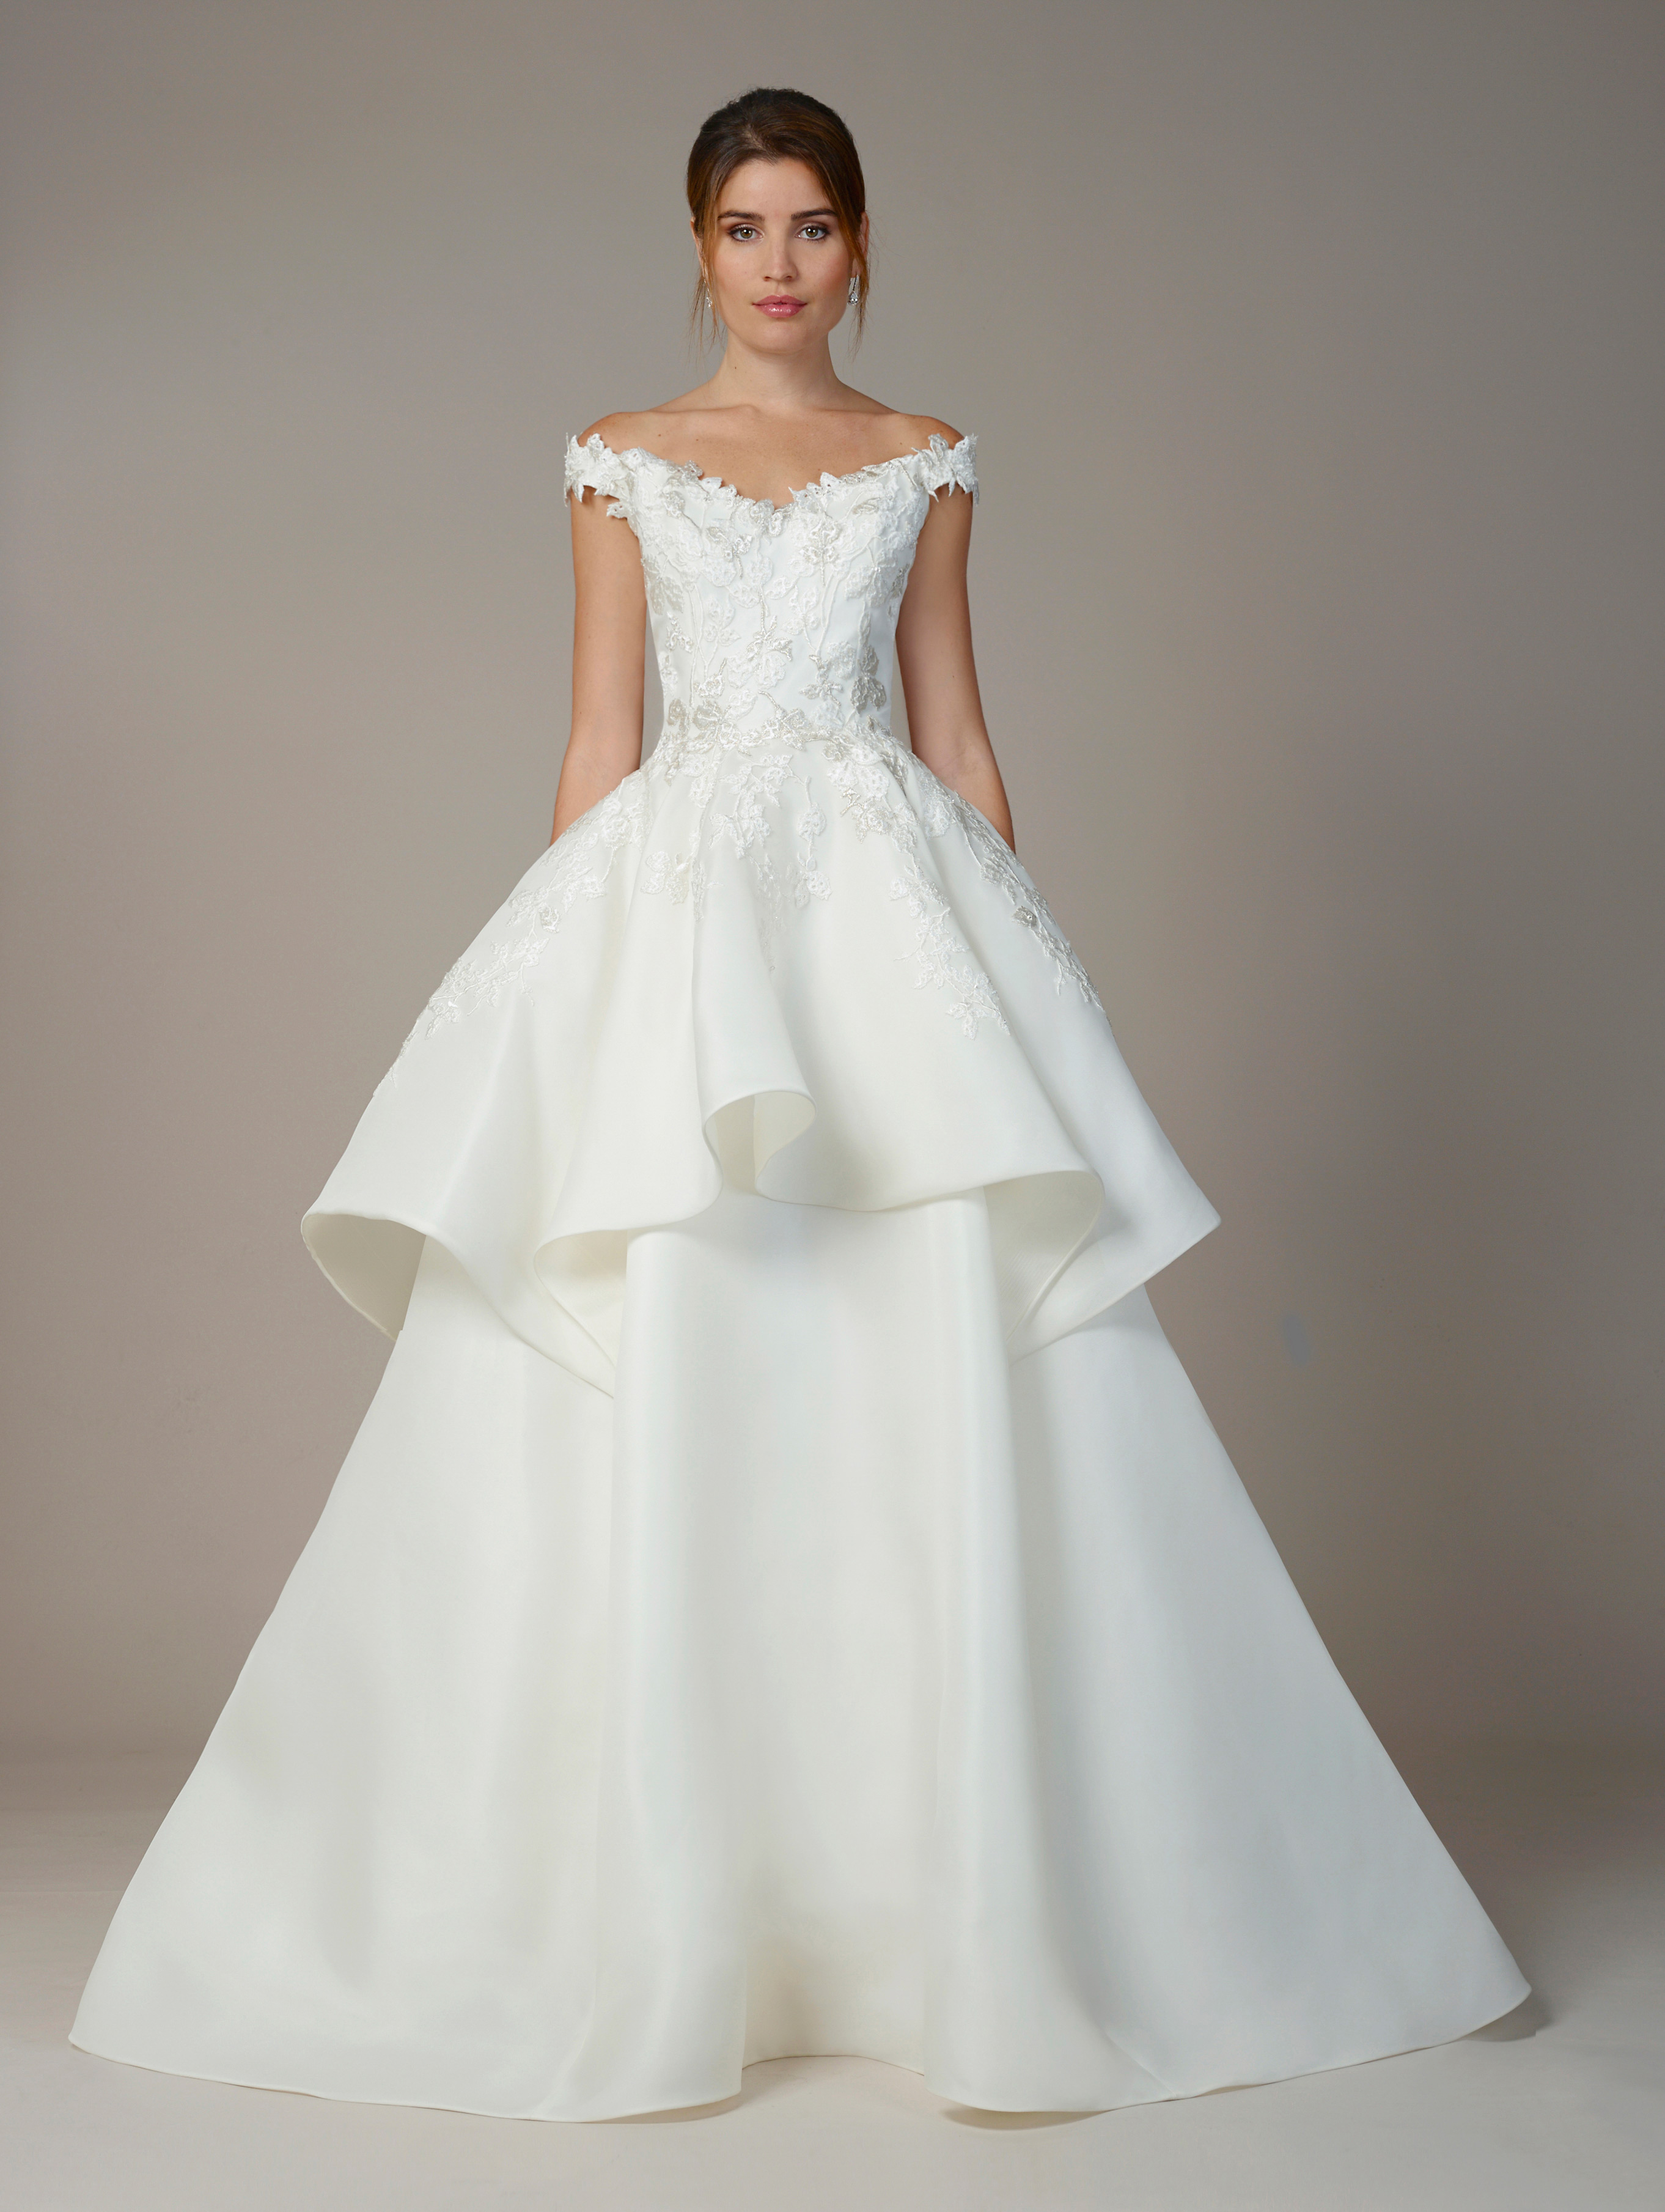 liancarlo wedding dress fall 2018 ballgown off-the-shoulder